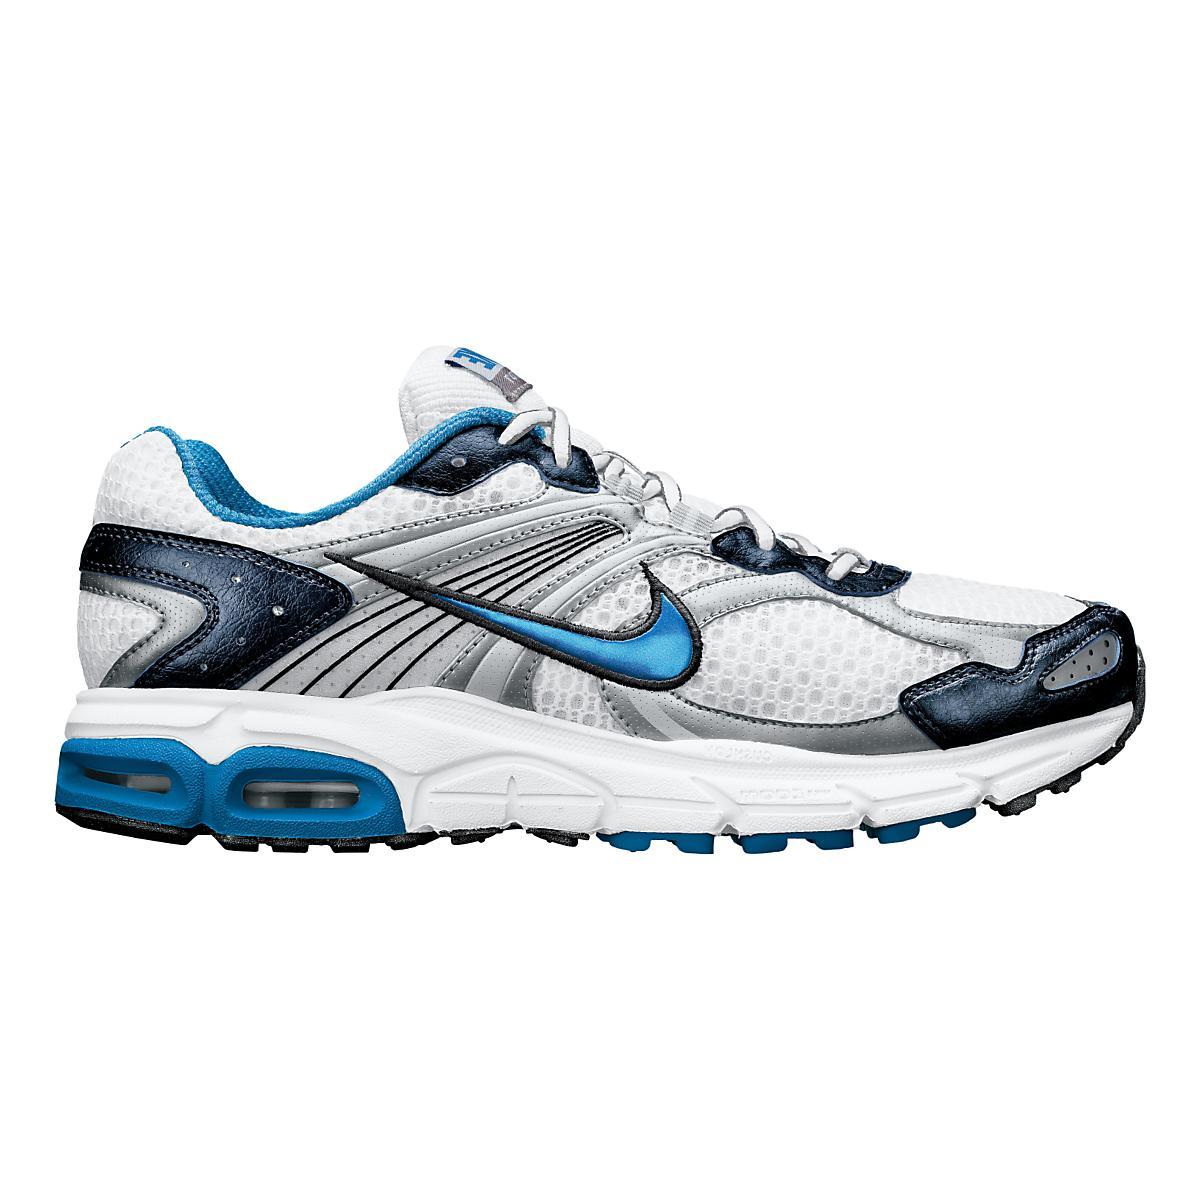 separation shoes e3478 d08ef Mens Nike Air Max Moto+ 7 Running Shoe at Road Runner Sports